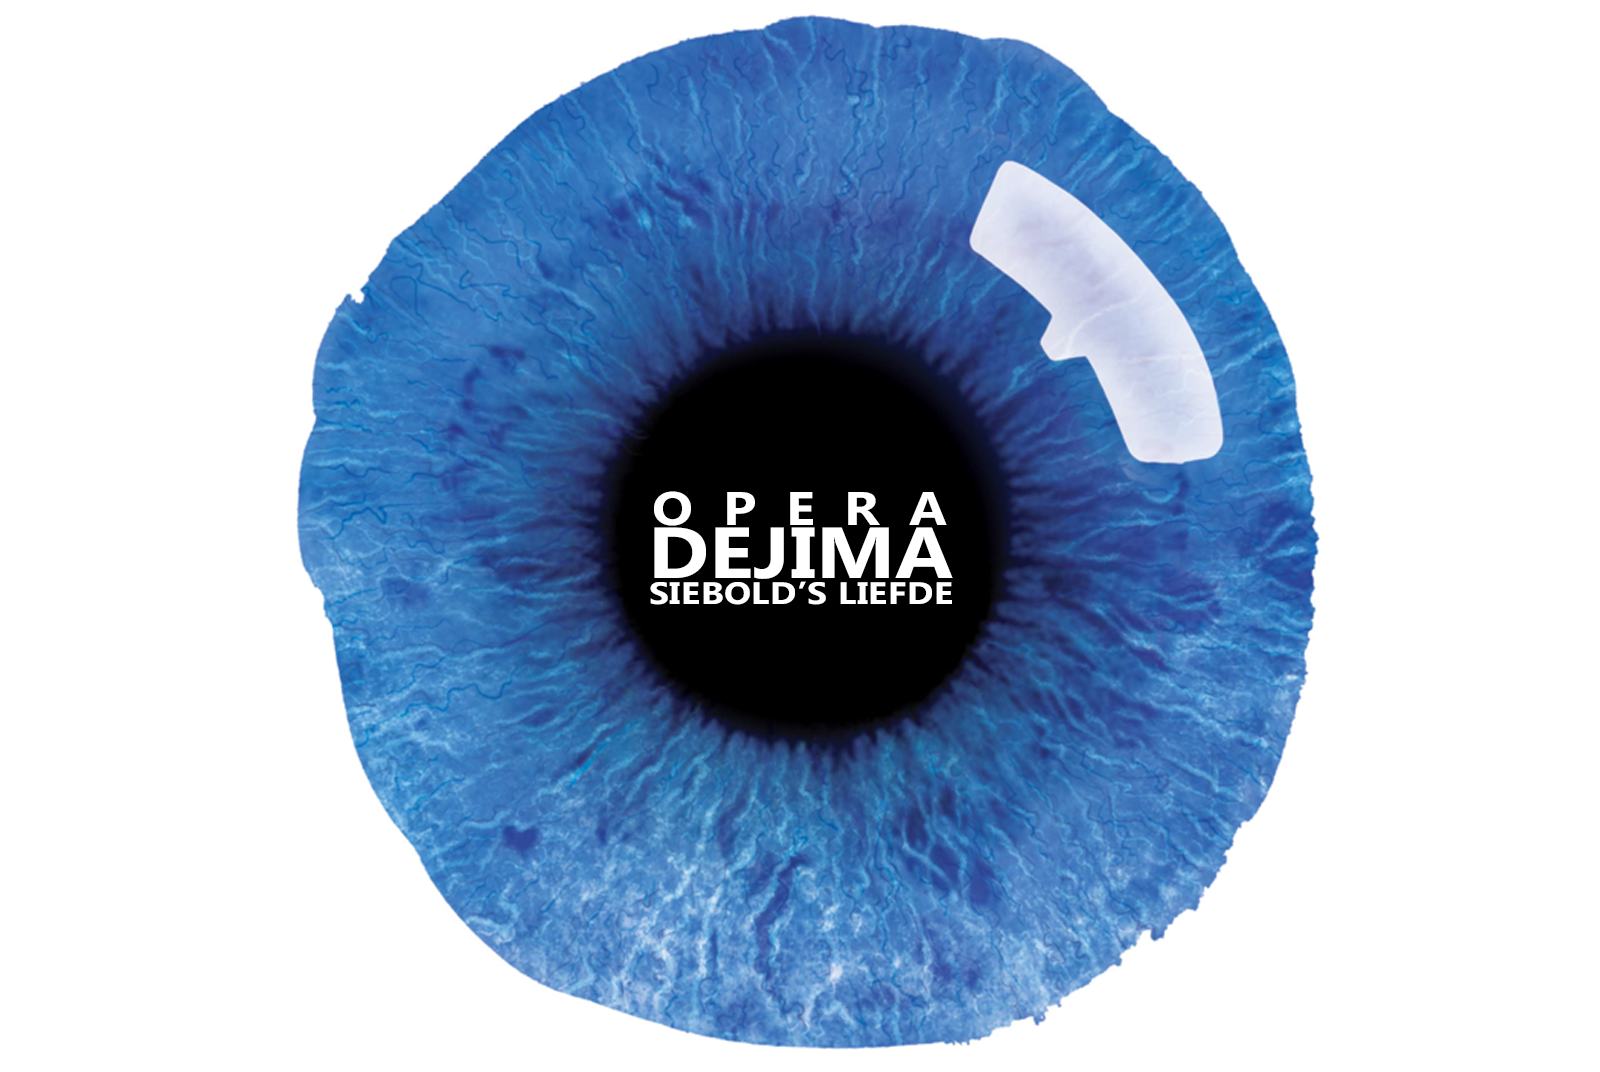 Dejima, Siebold's Liefde